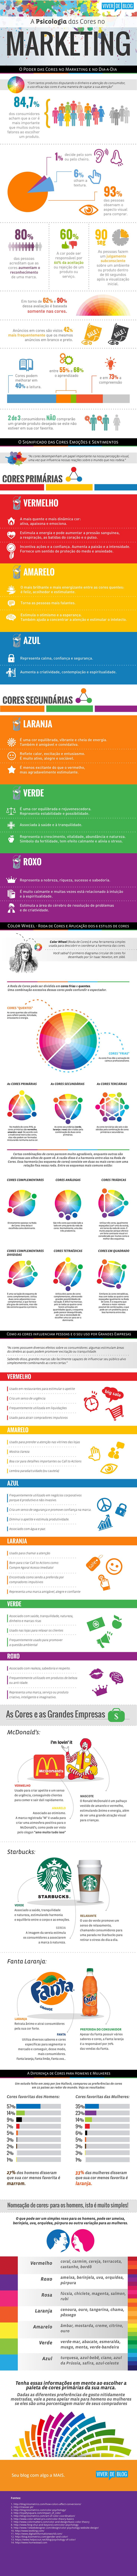 Infográfico: A Psicologia das Cores → http://landing.viverdeblog.com/baixar-infografico-psicologia-das-cores-fb